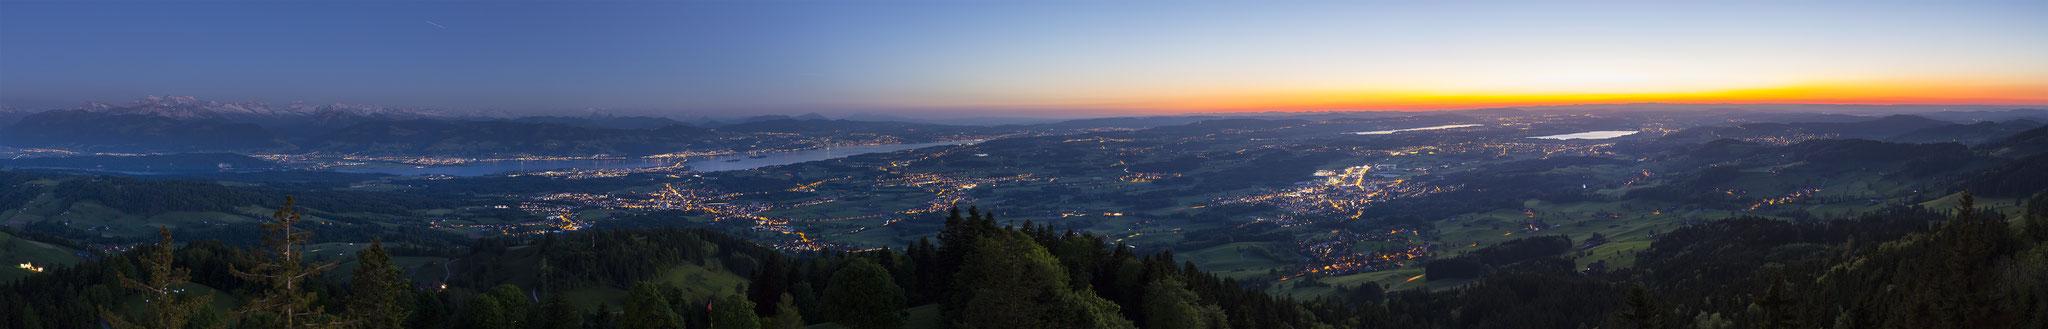 Bachtel during Sunset (P1)